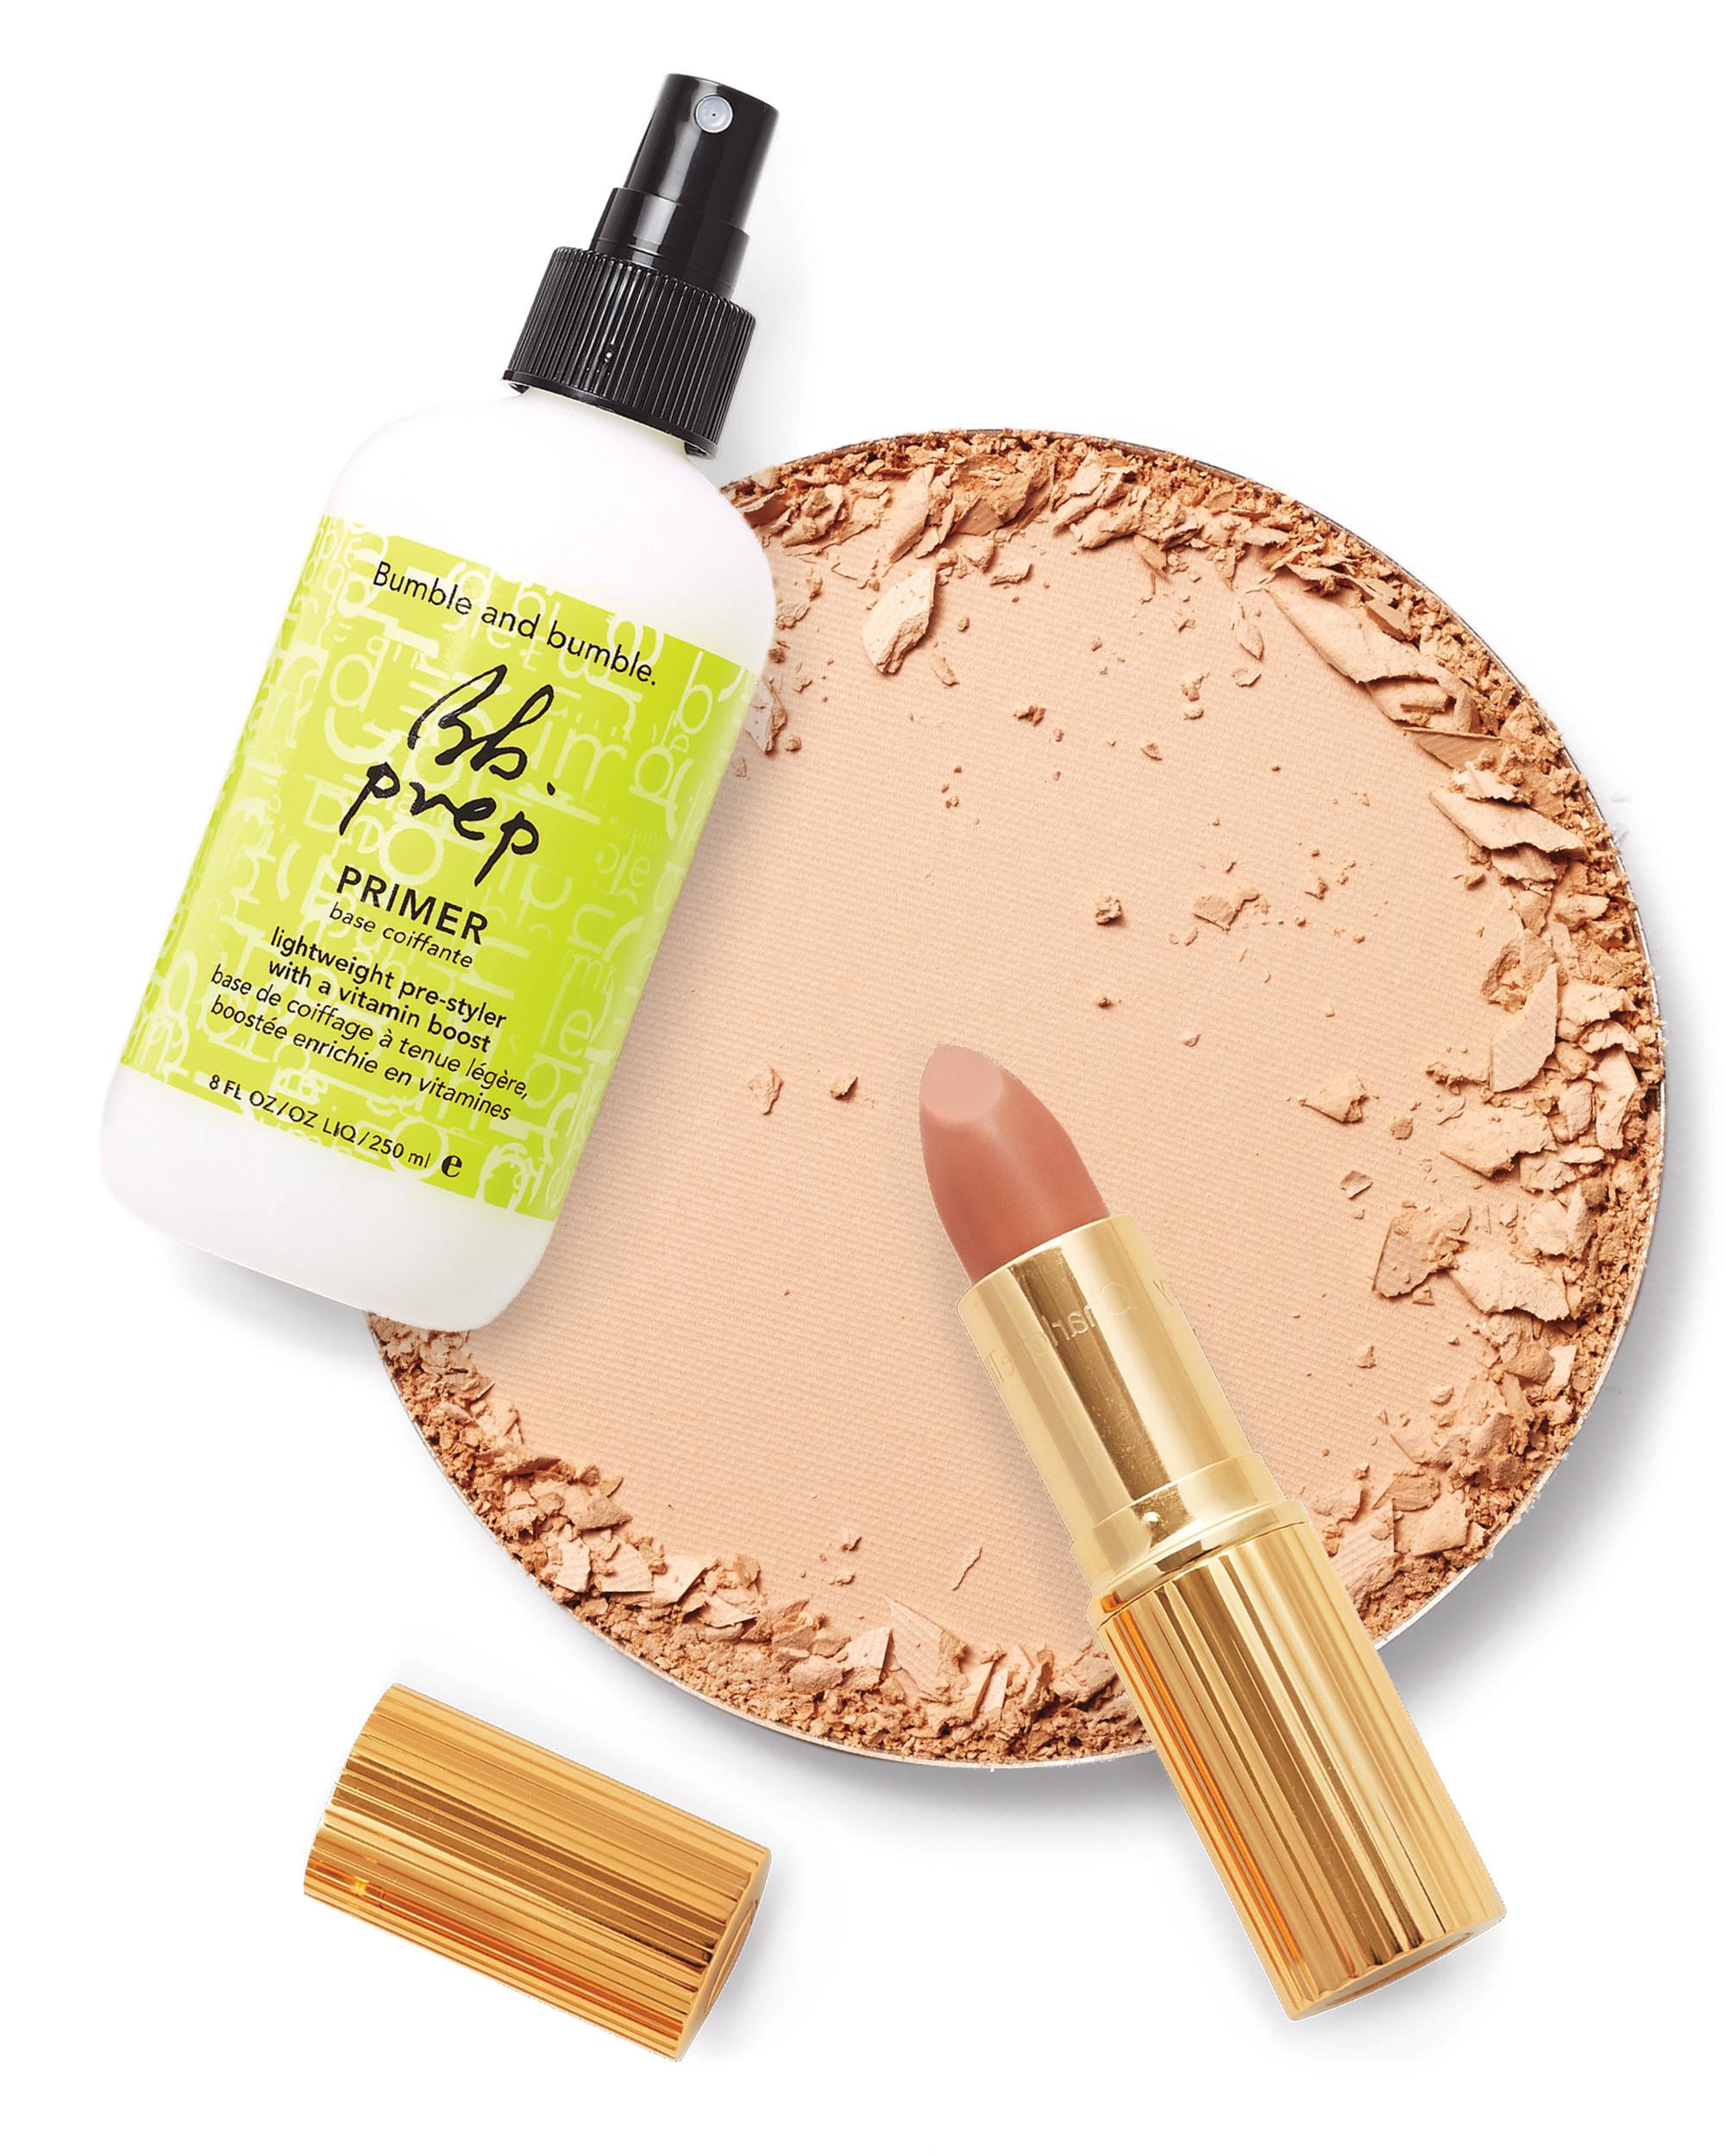 aisle-icon-beauty-products-kate-moss-0115.jpg